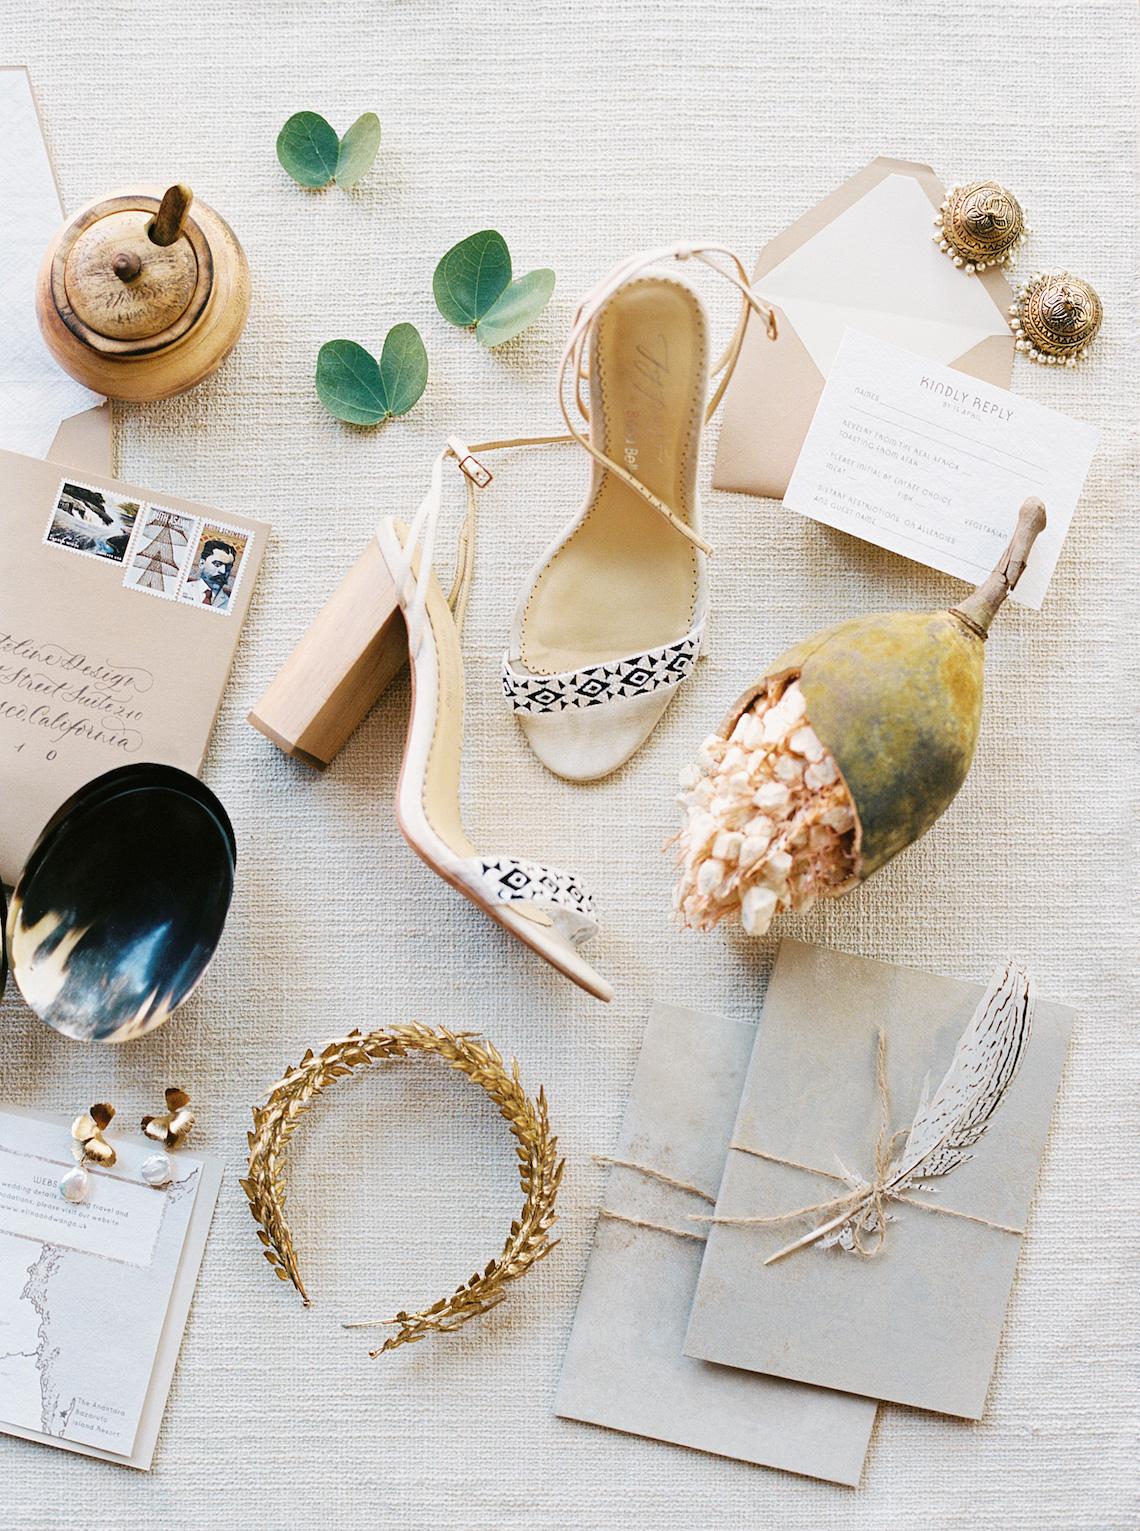 Royal Livingtone by Anantara – Zambia Honeymoon and Destination Wedding Guide – Love From Mwai – Exalt Africa – Joy Proctor Design – Stepan Vrzala – Exalt Africa – Bridal Musings 16